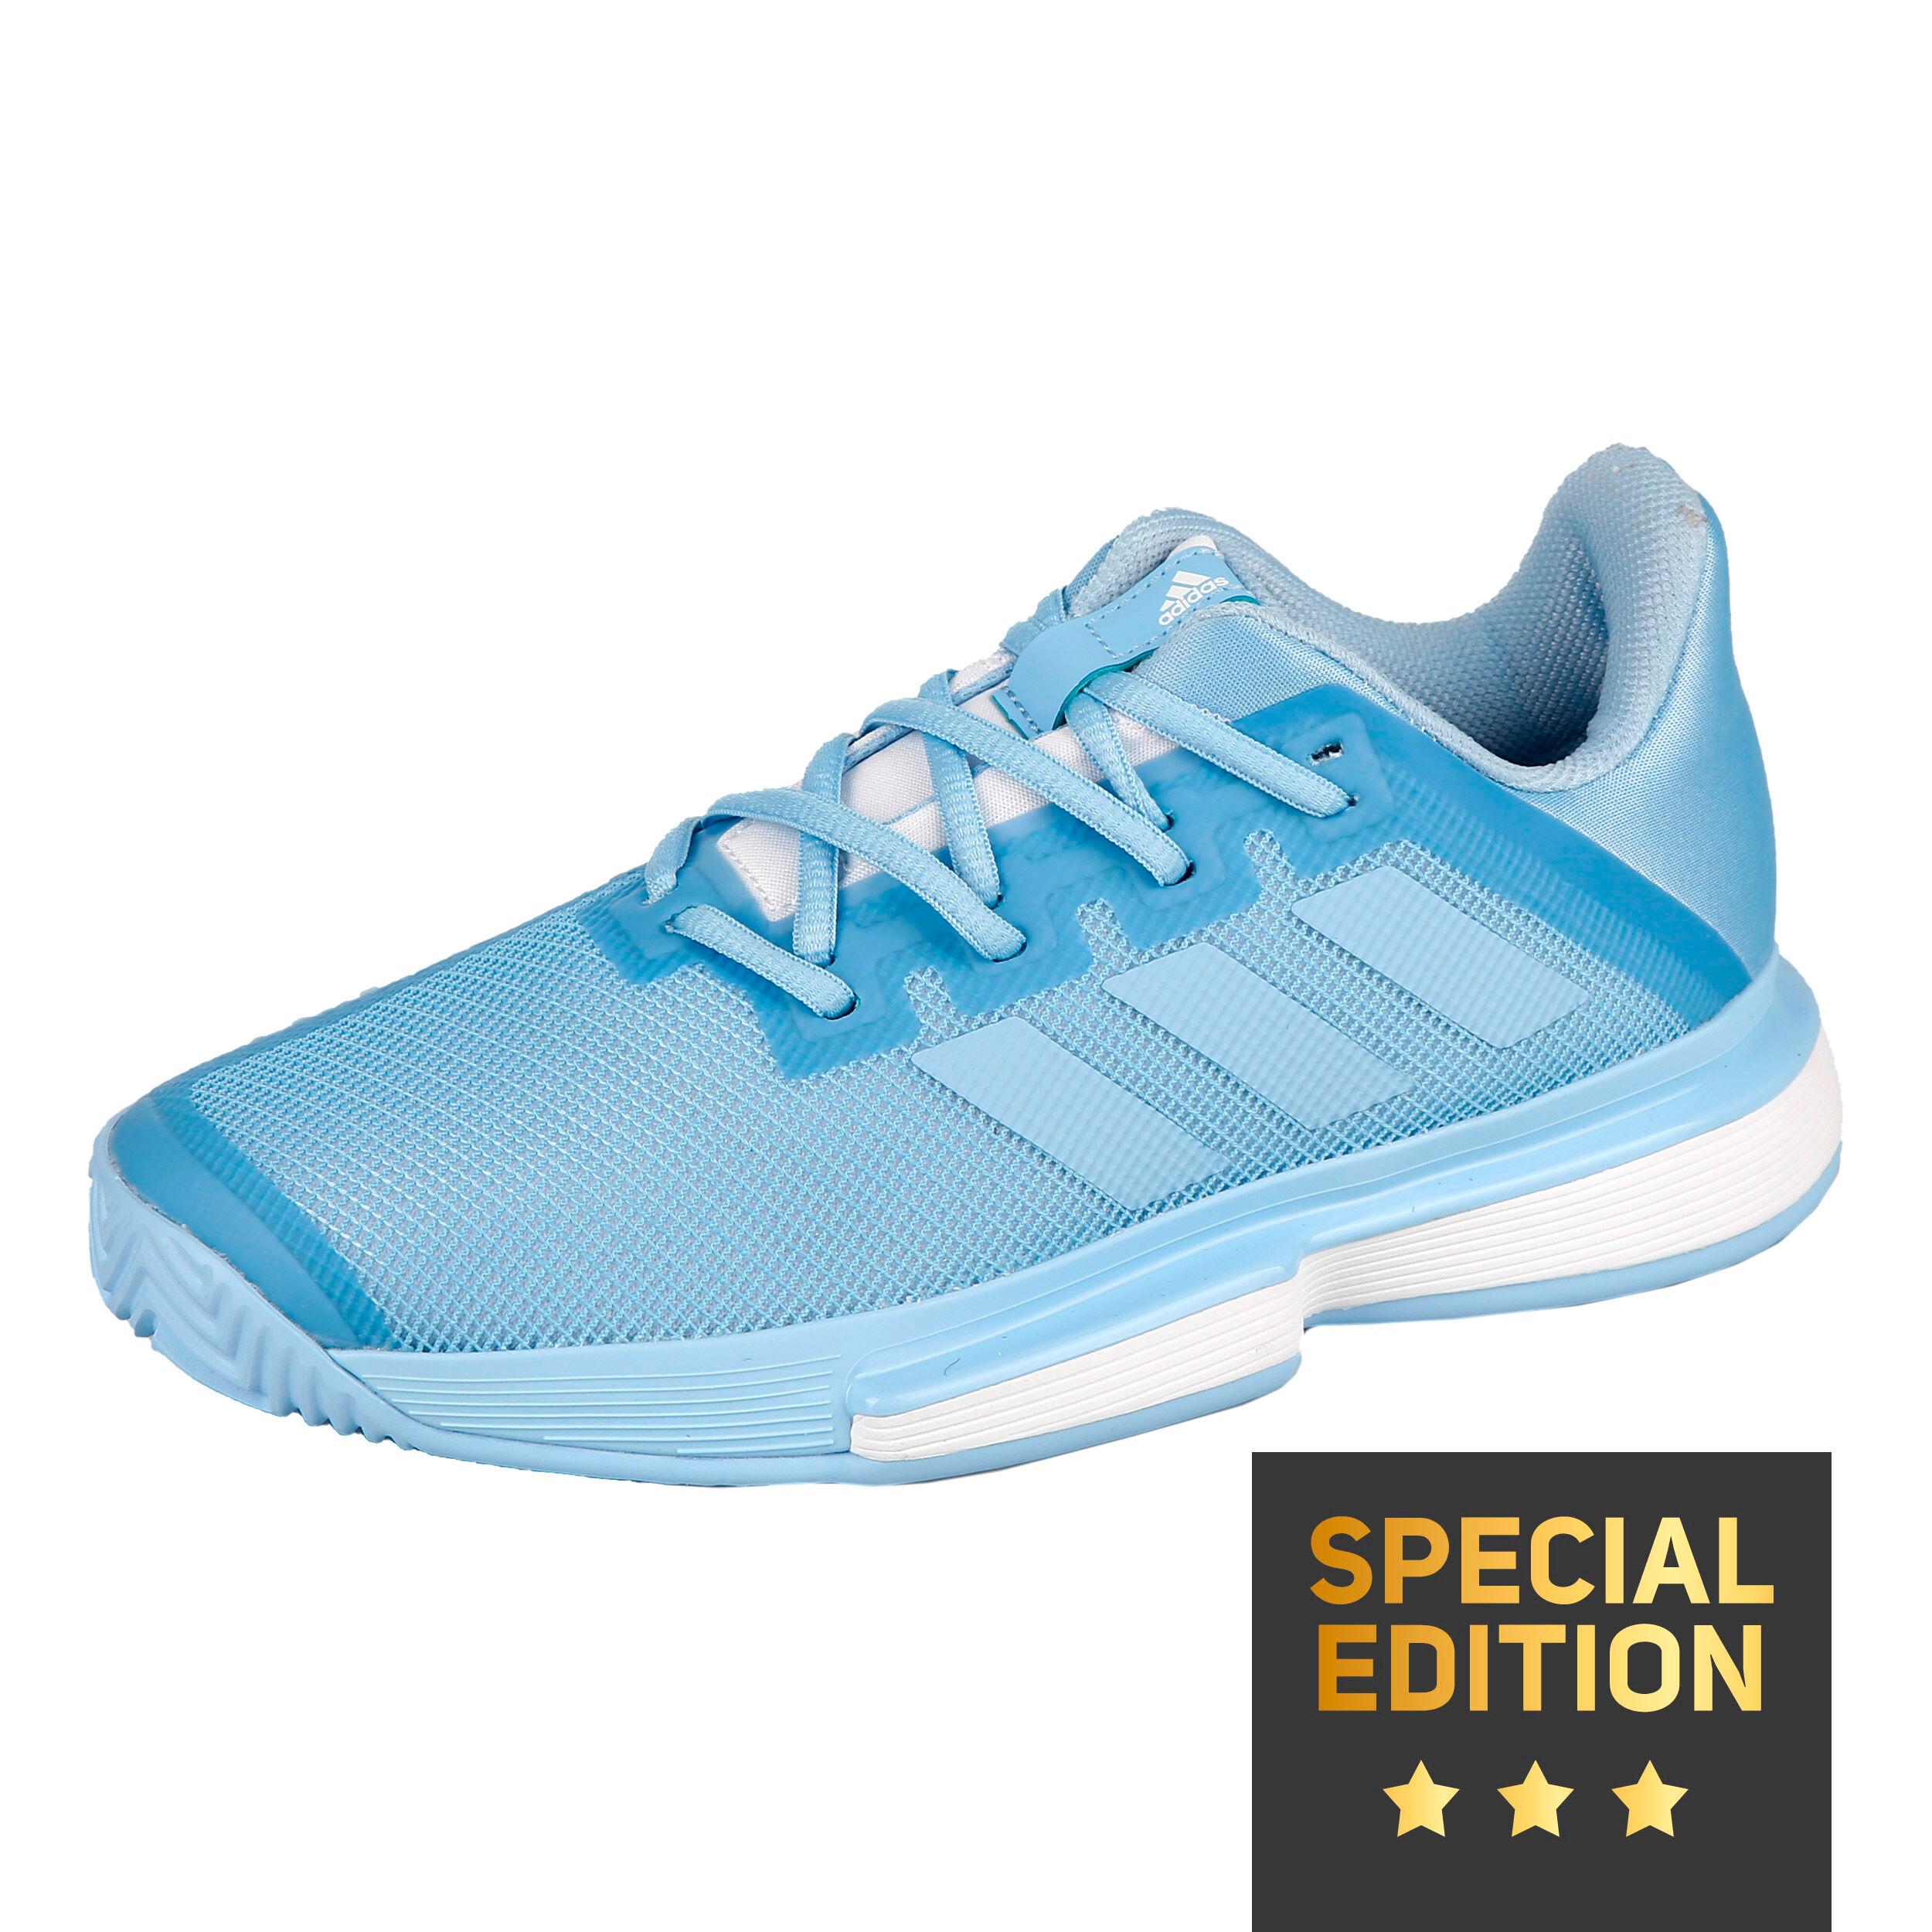 35% adidas Adizero Ubersonic 2 Men Scarpe Da Tennis